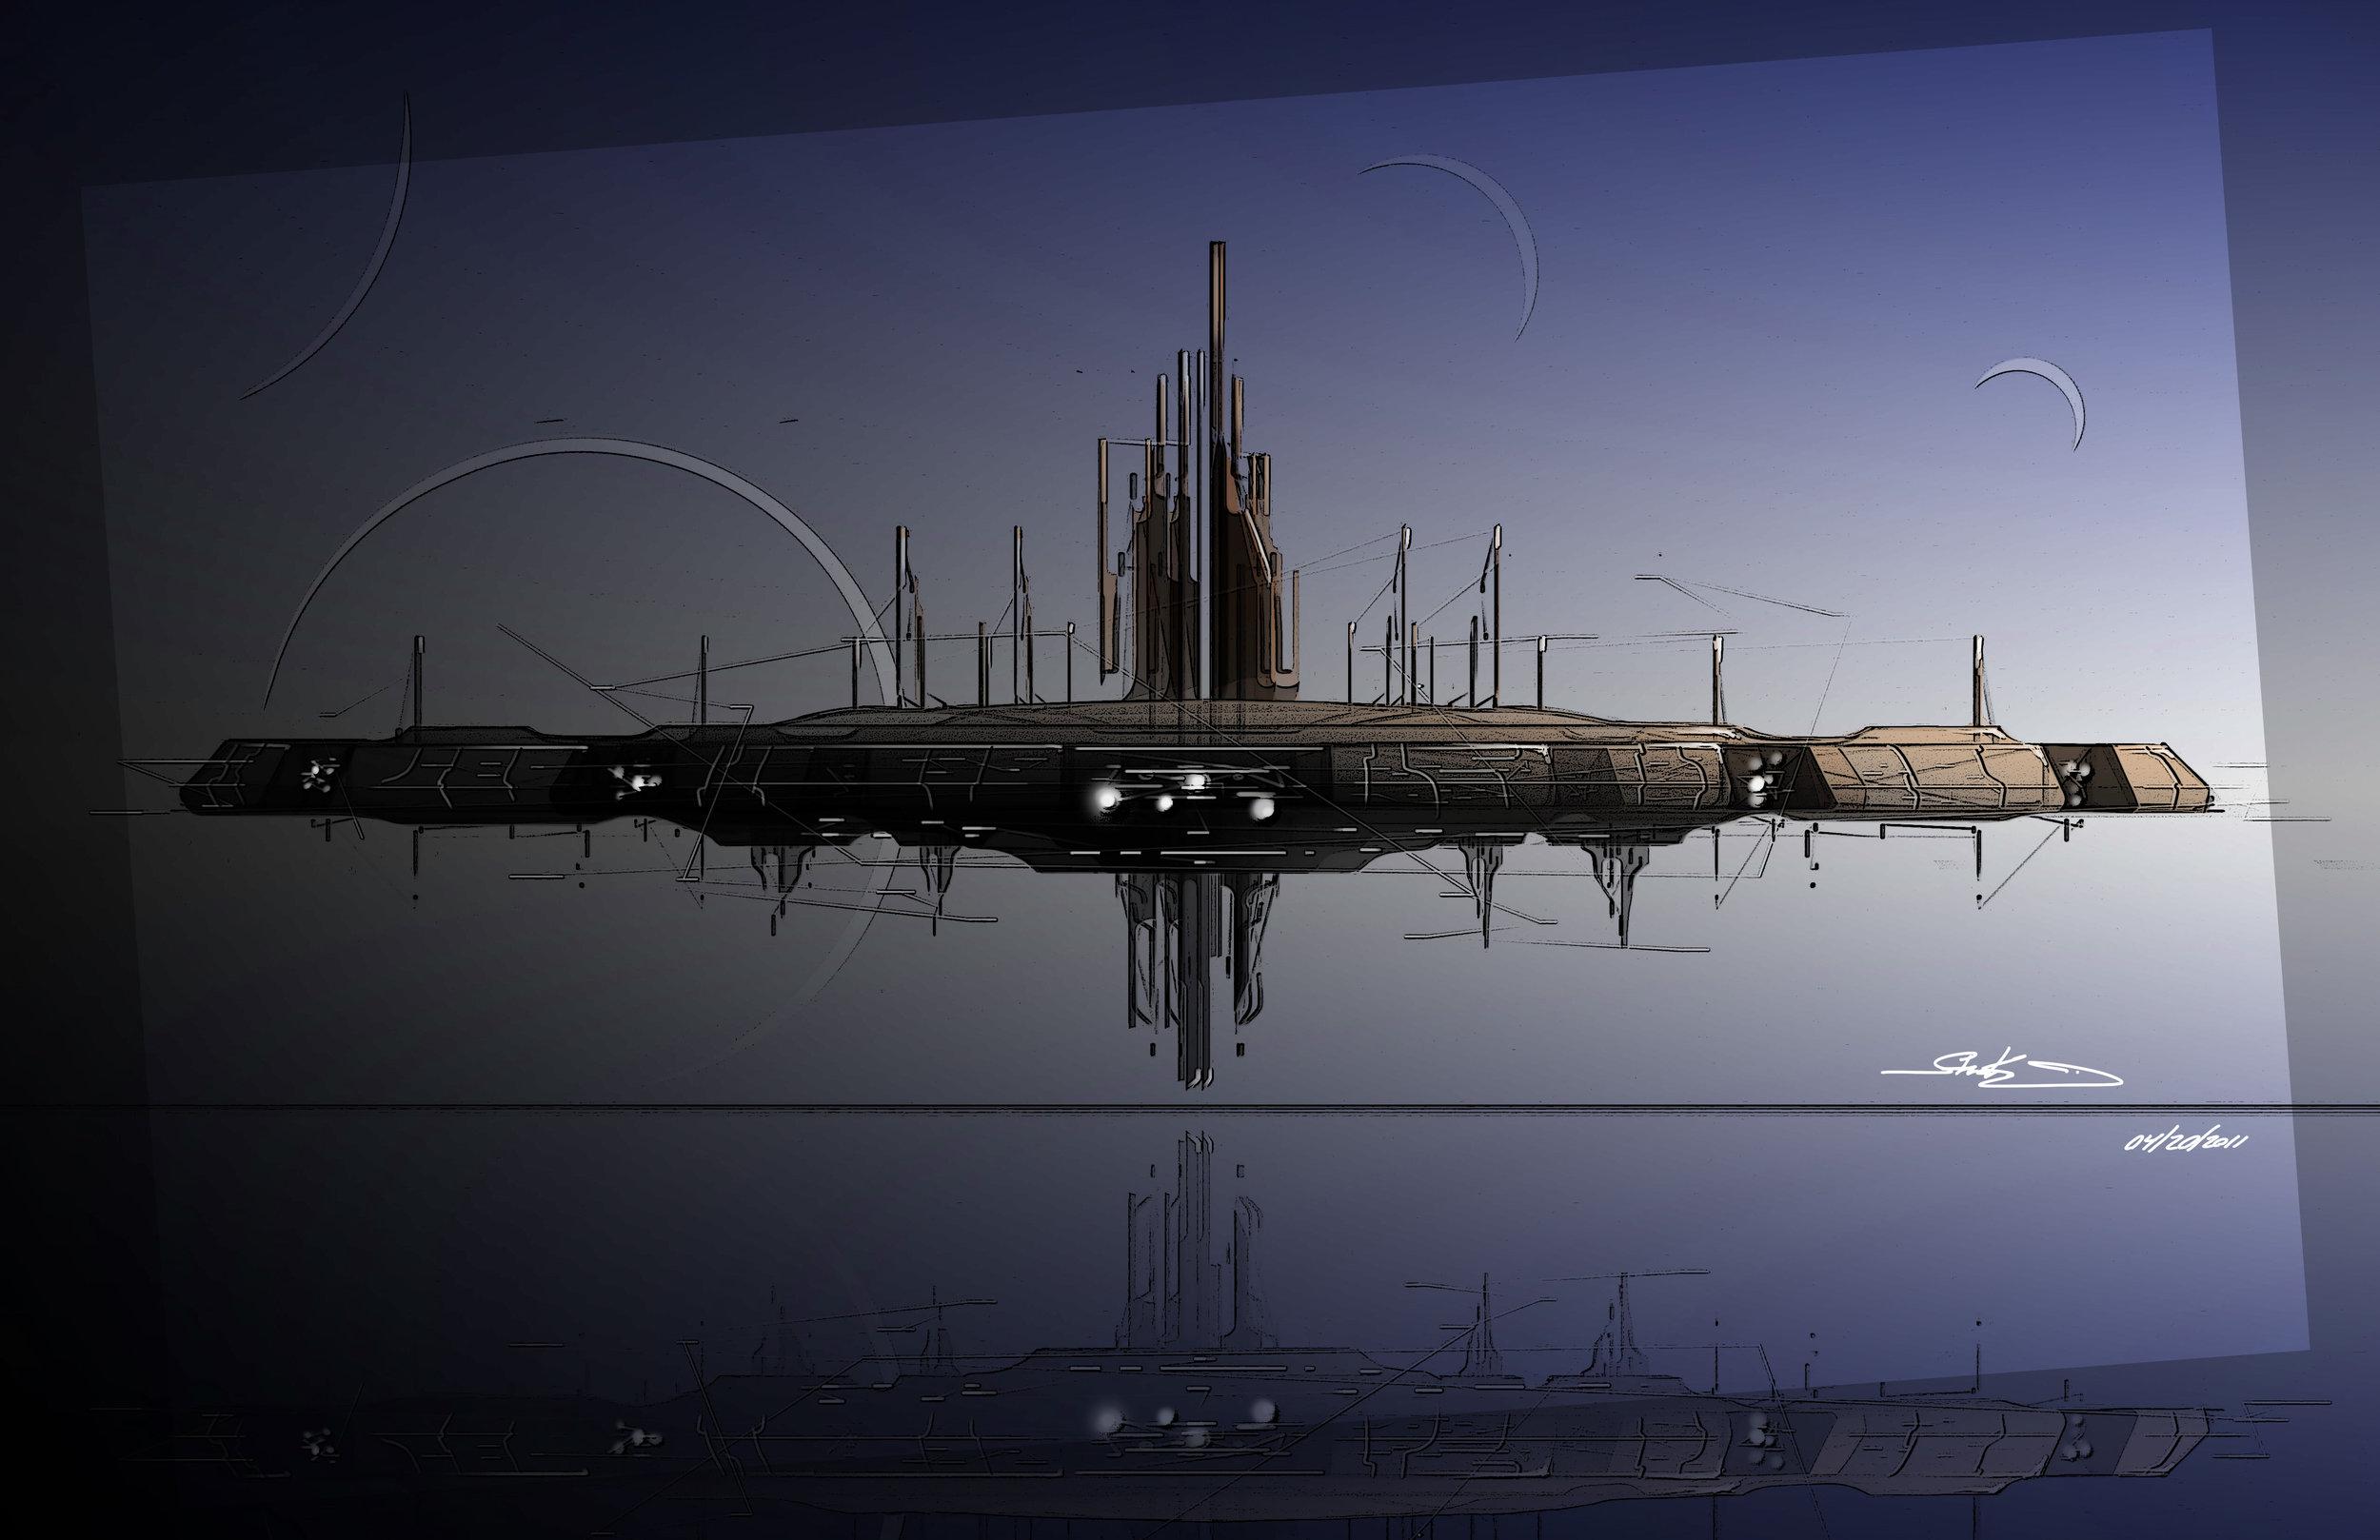 Ship_Thesese_2.jpg